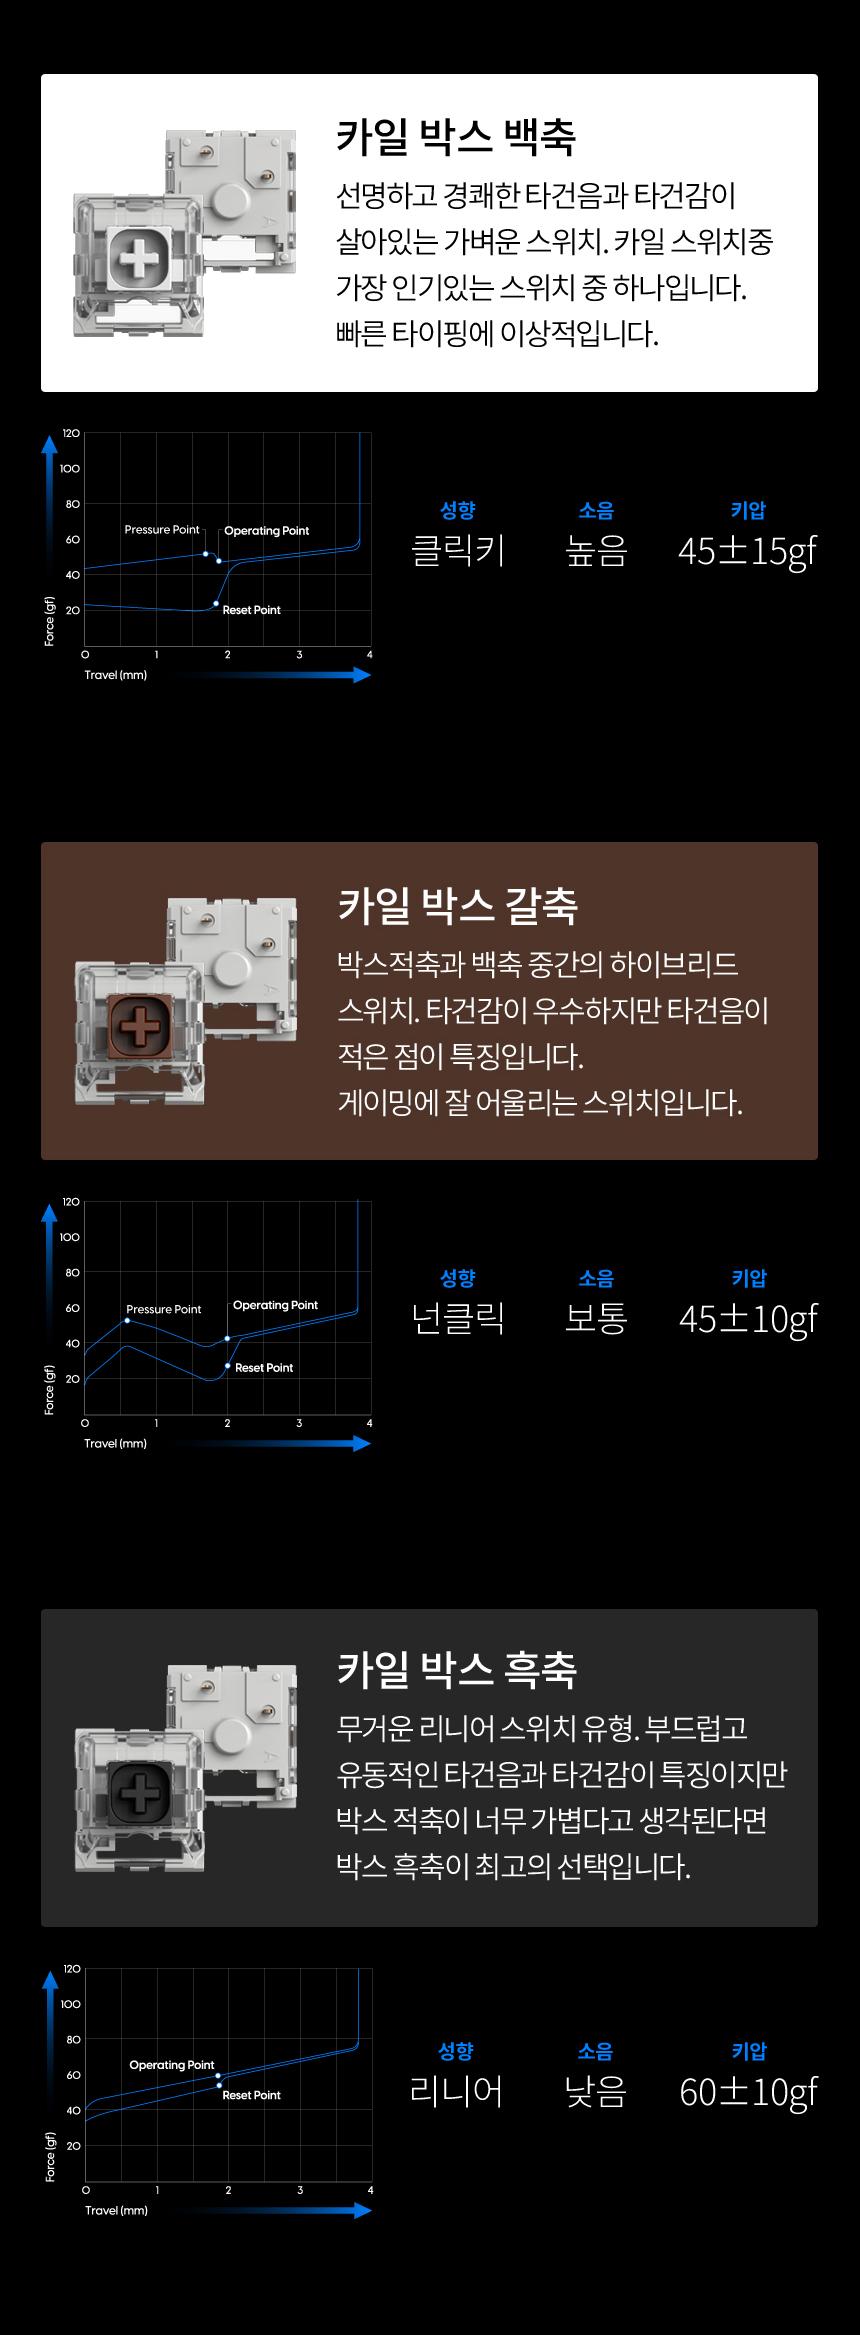 Pulsar 카일 기계식 스위치 10피스 (무소음 핑크축)